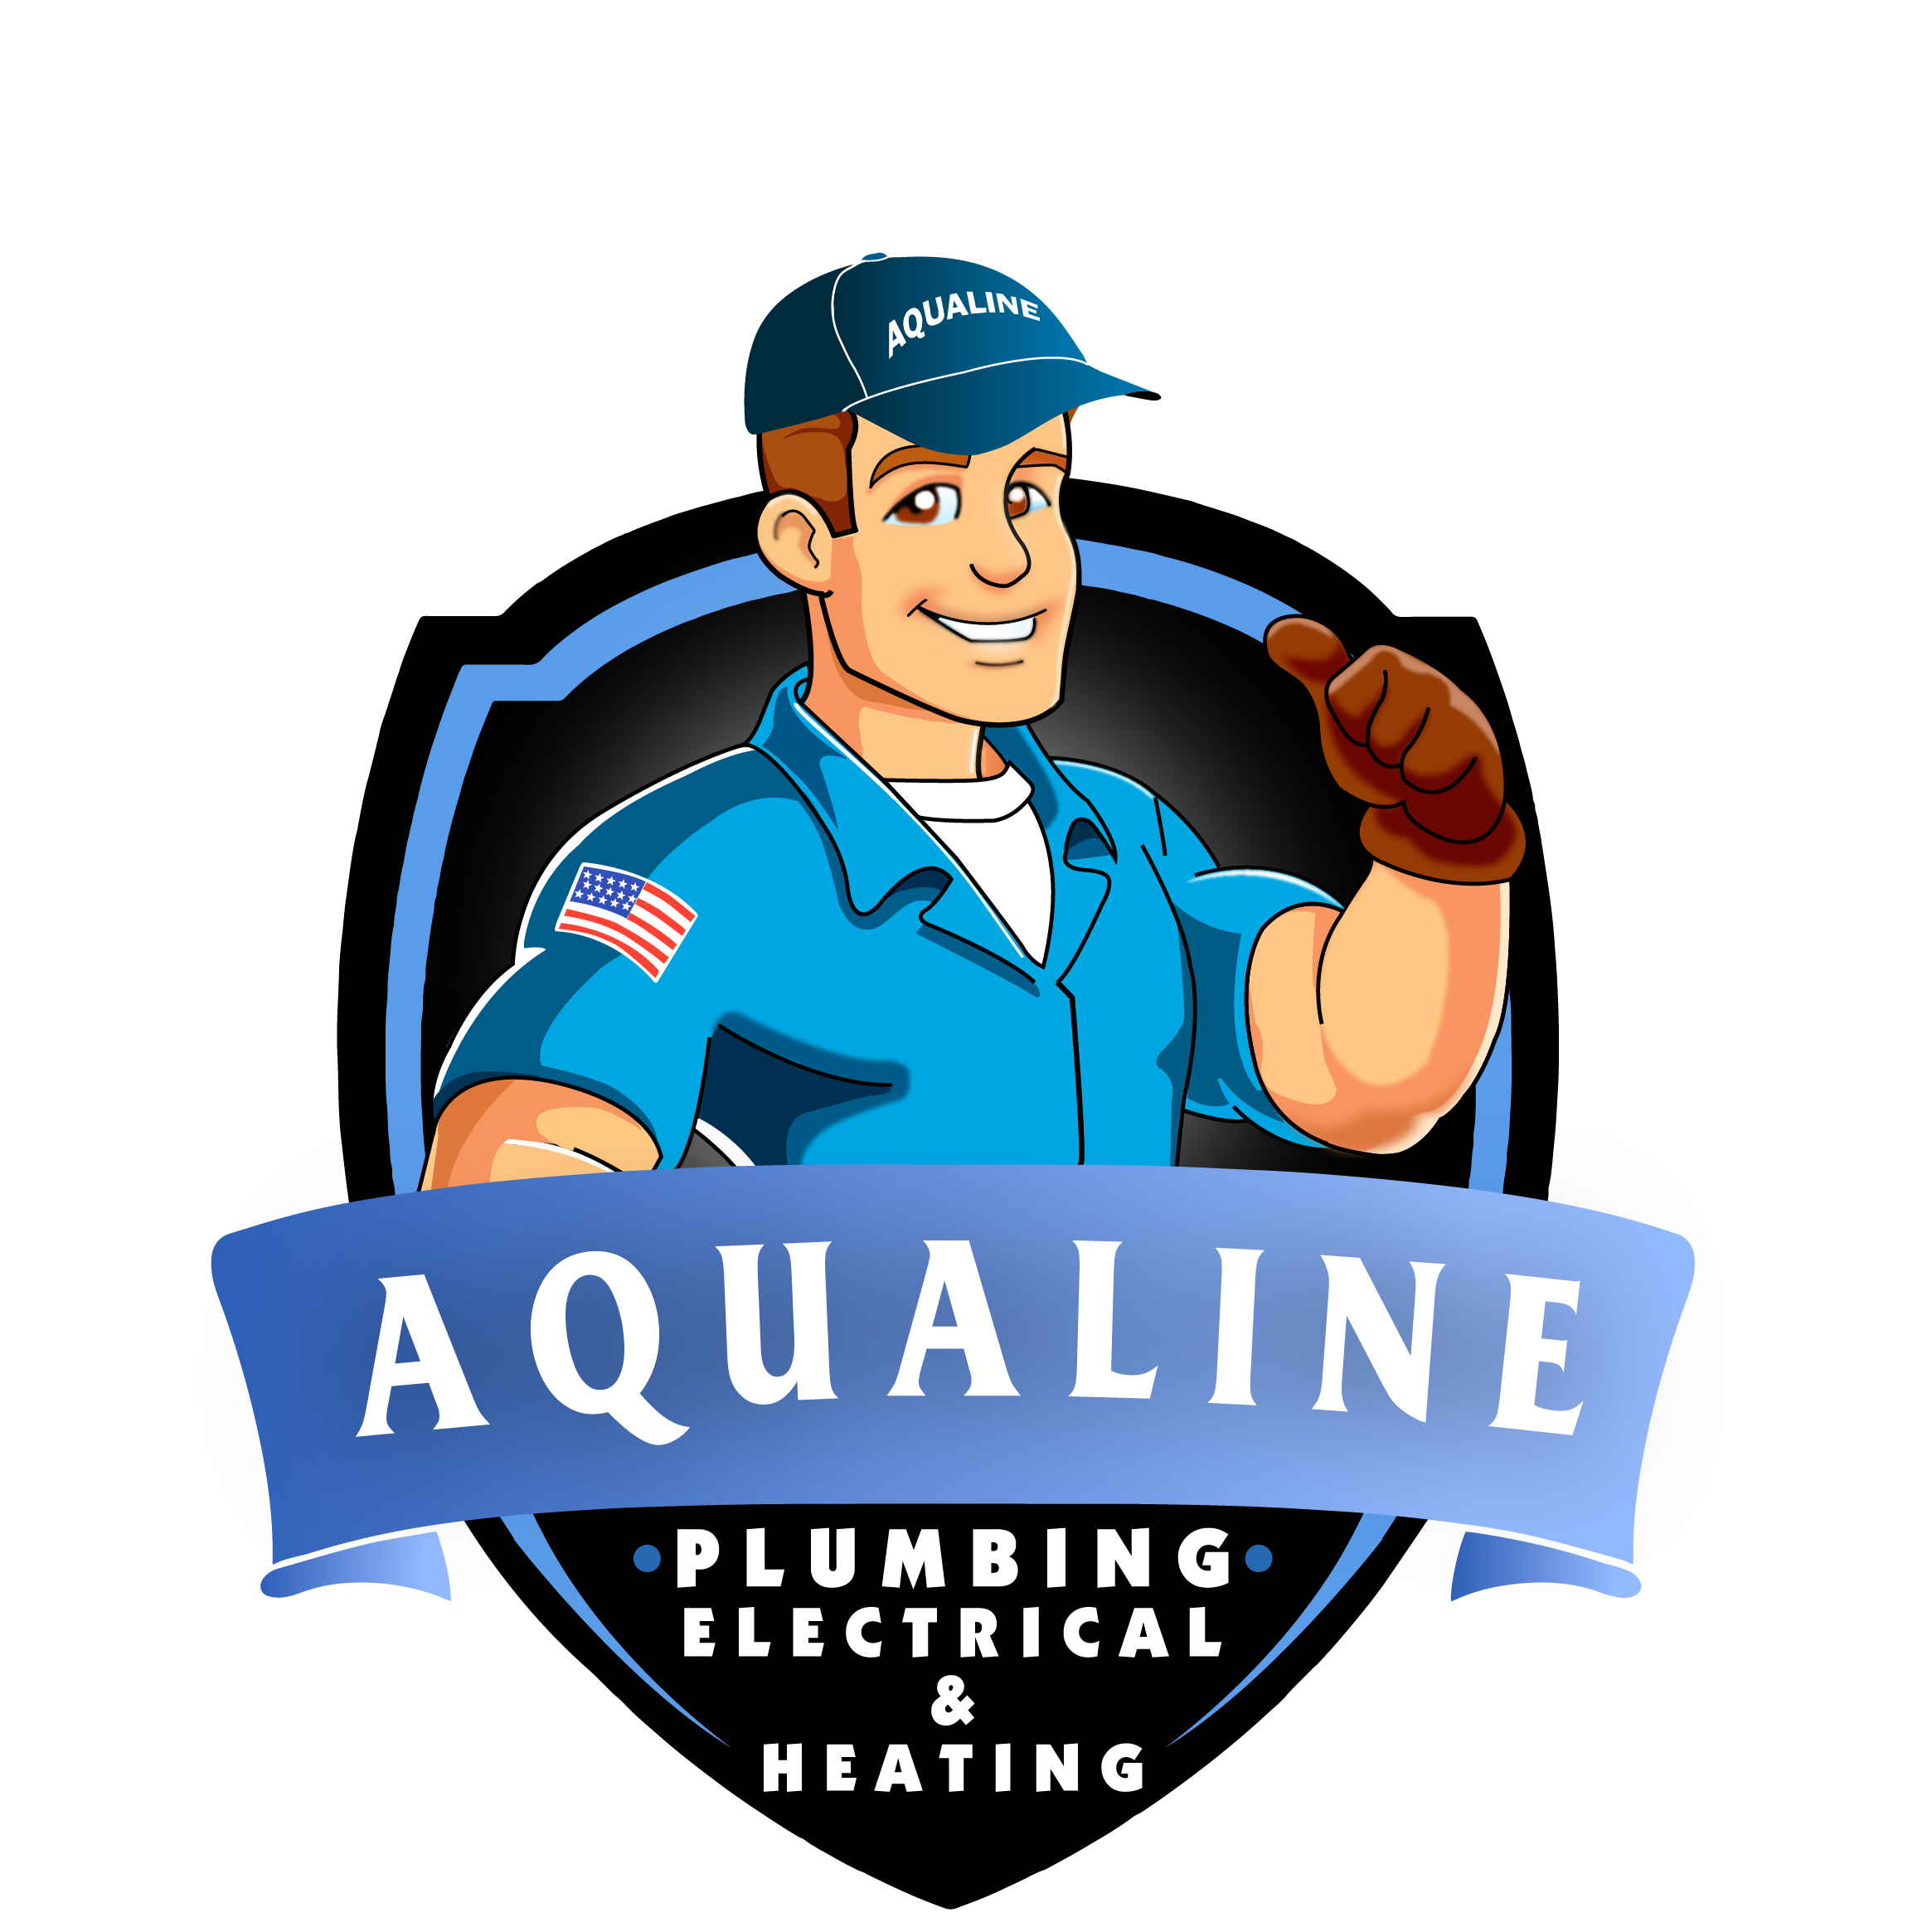 Aqualine Plumbing, Electrical & Heating